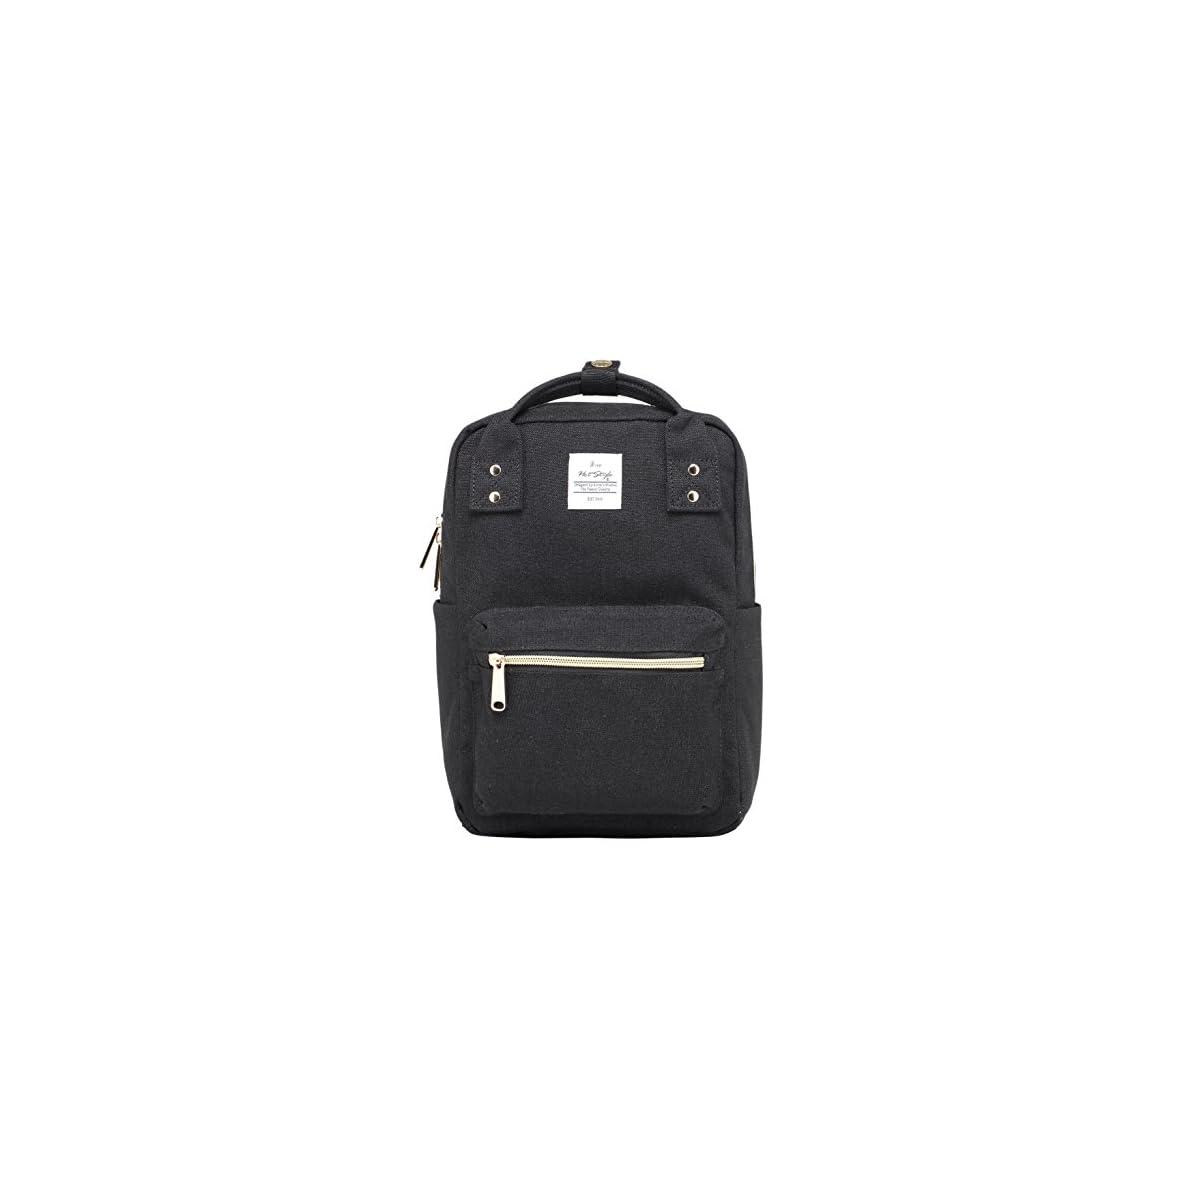 51SWyb1JKSL. SS1200  - DISA Mini Bolso Mochila pequeño | Cabe un iPad de 10 Pulgadas | 29,5x20x11 cm